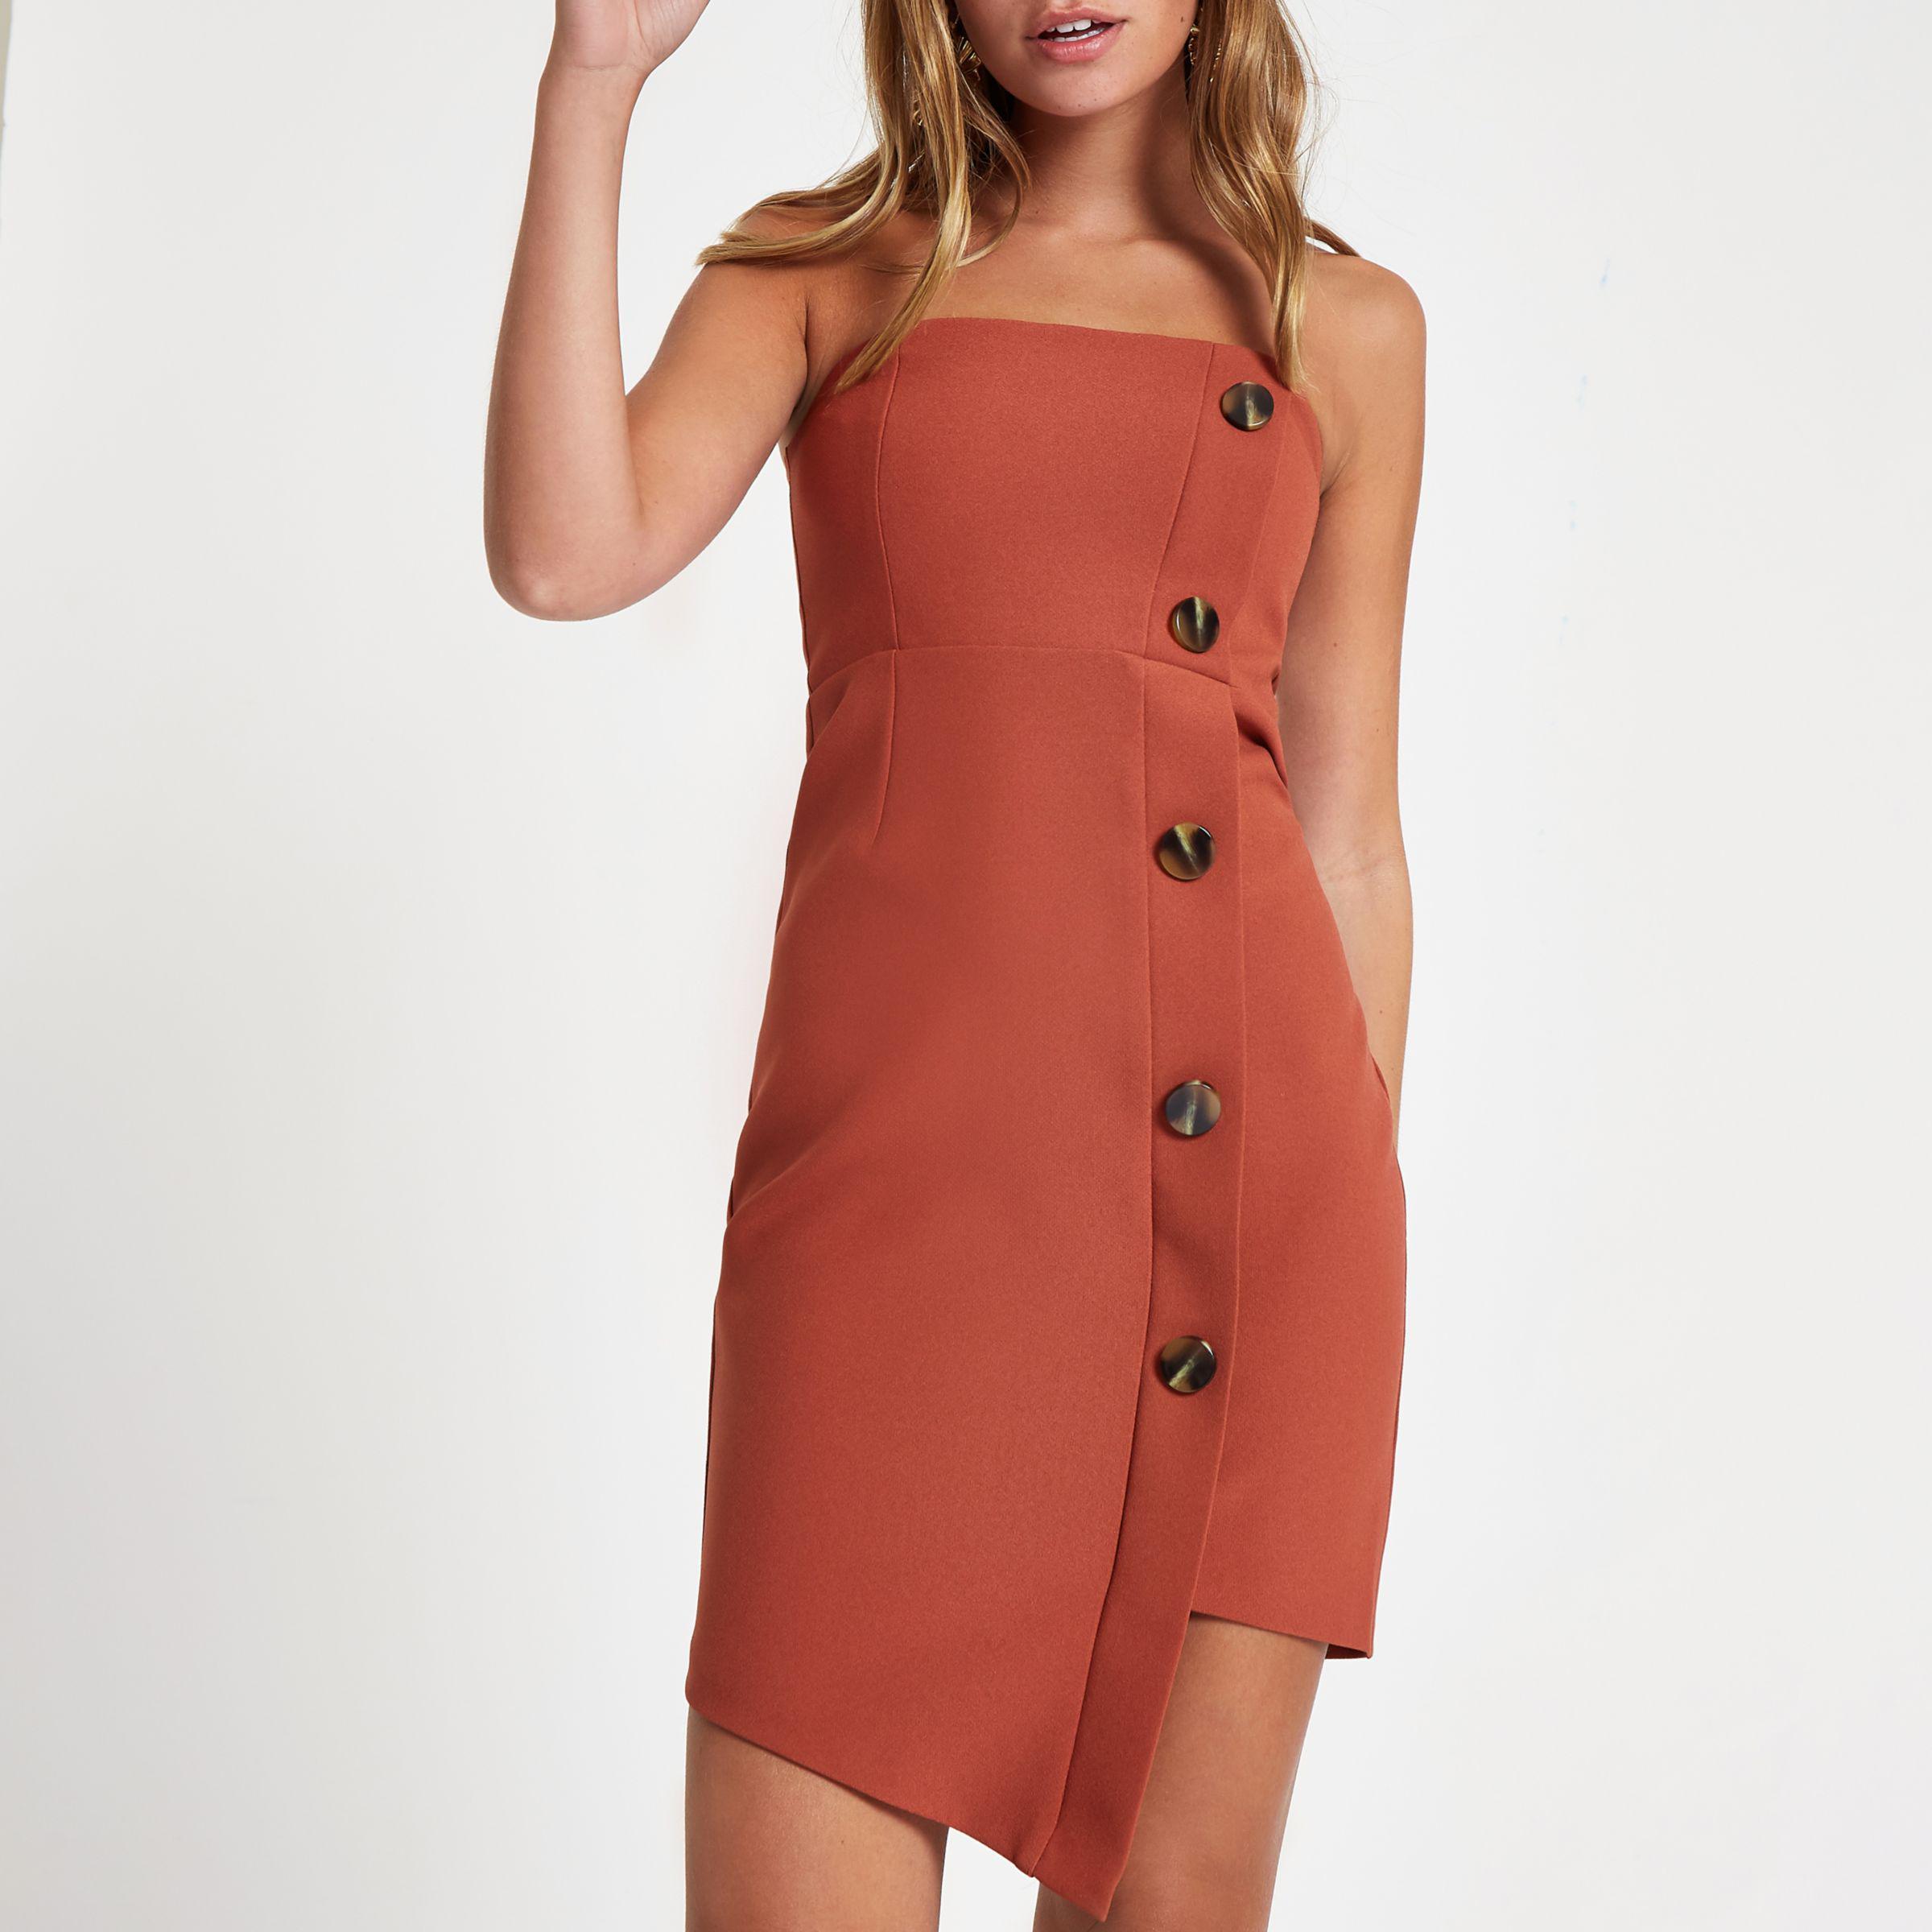 19d4d26424fd5 Lyst - River Island Petite Rust Button Bandeau Mini Dress in Brown